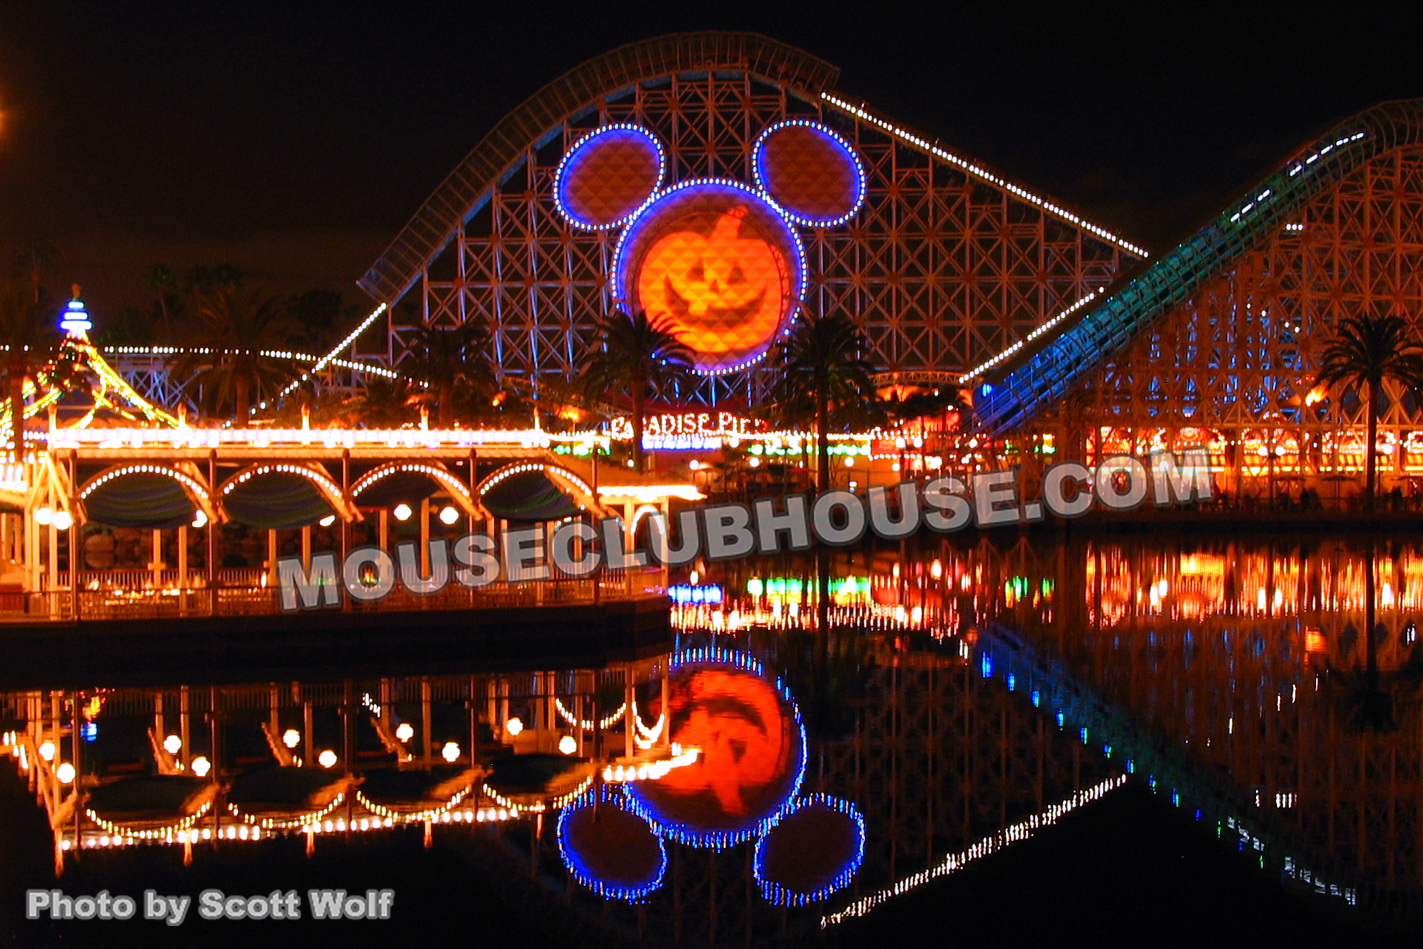 Halloween at Disney California Adventure 2005